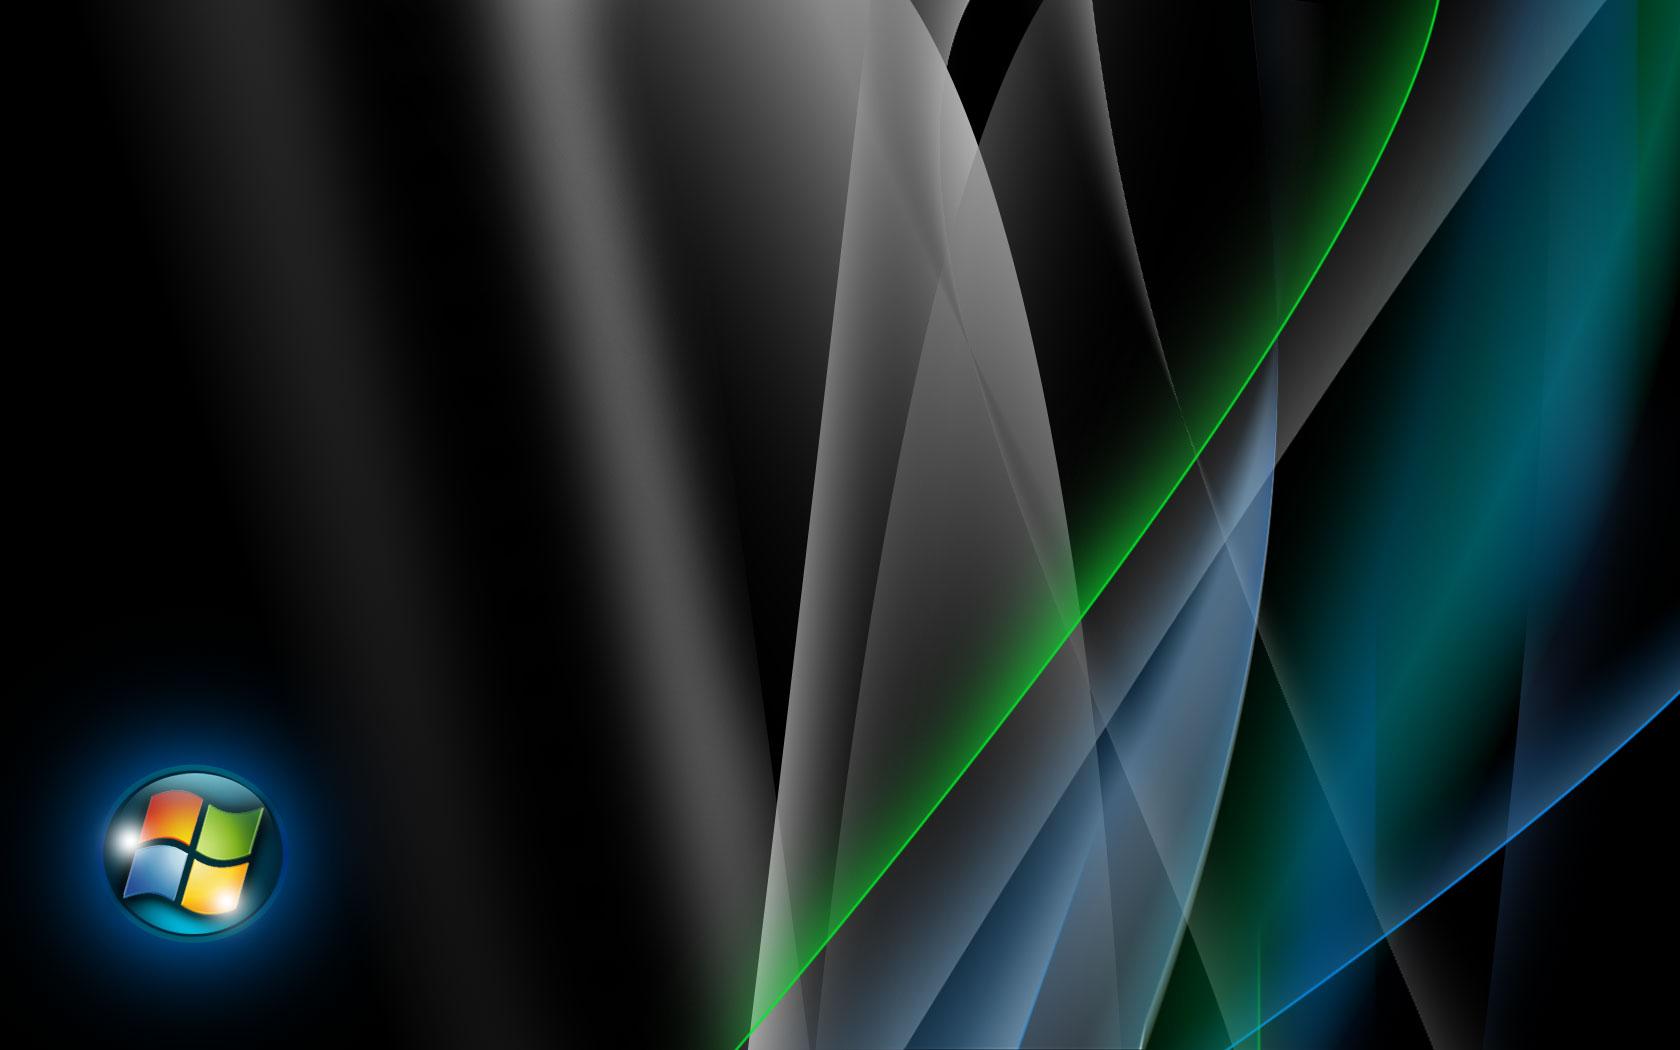 Vista Style Wallpaper Techniques   DevWebProDevWebPro 1680x1050